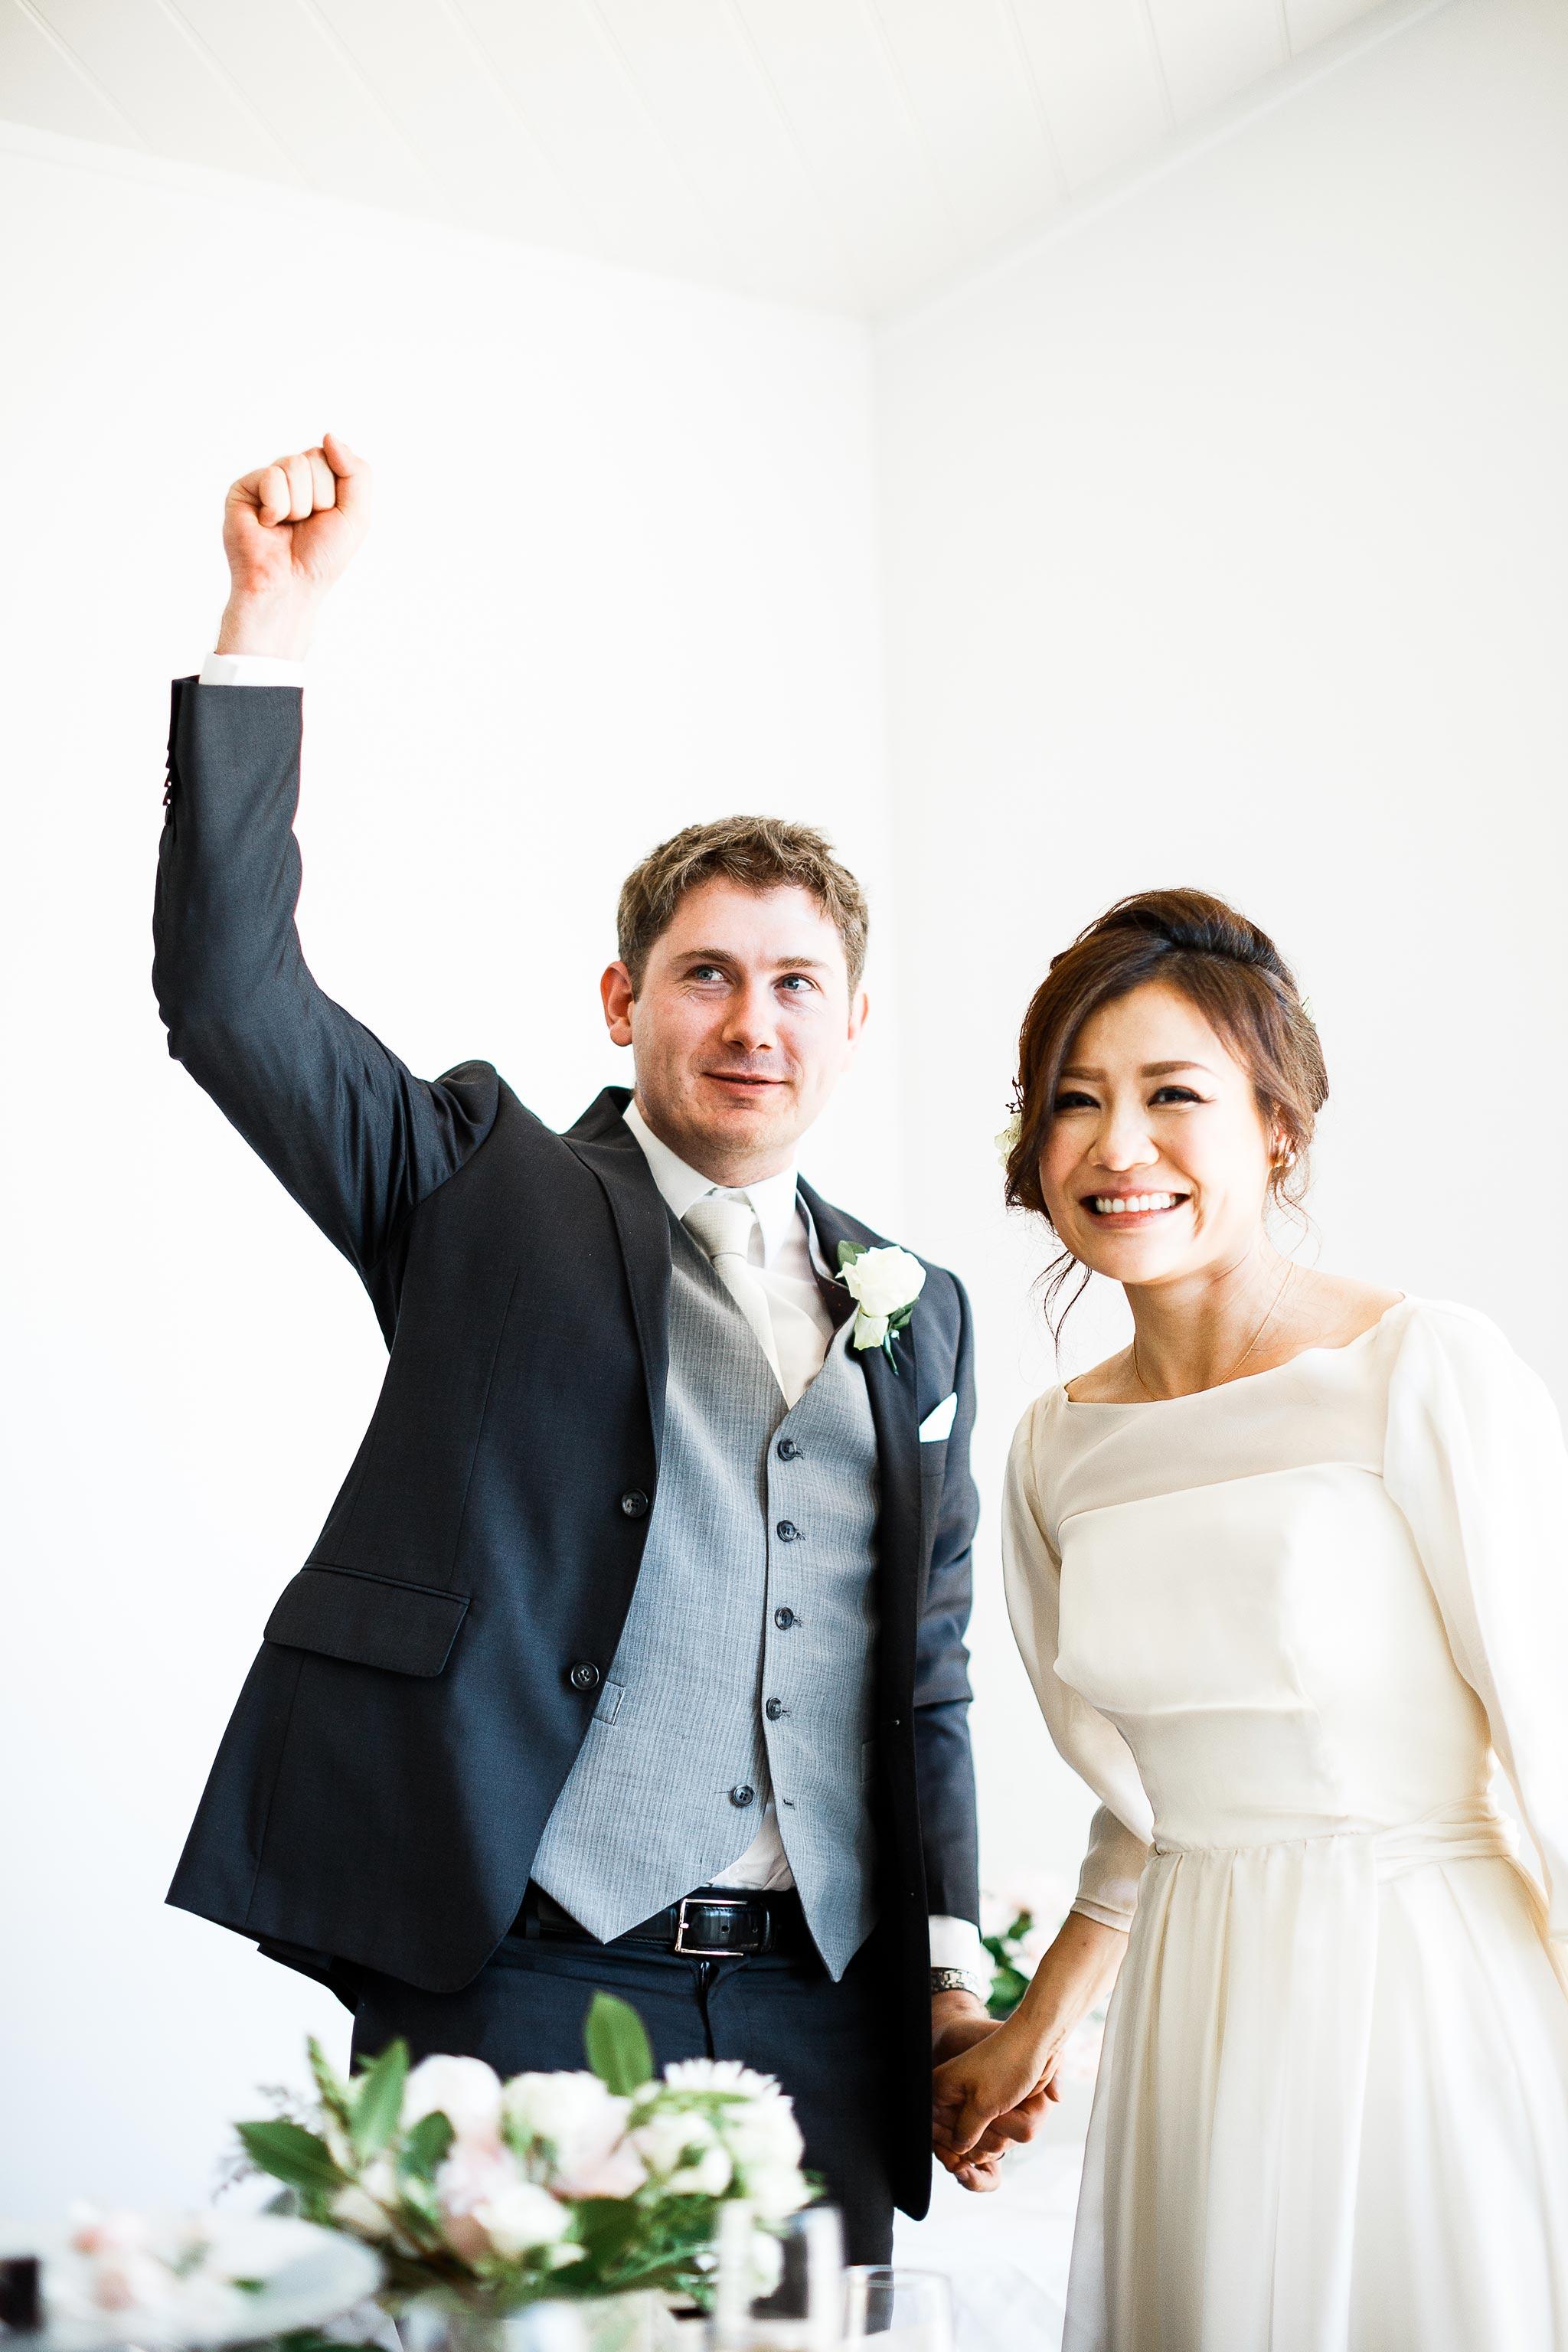 Daylesford-Lake-House-Wedding-Photographer-lunch-reception-bride-groom